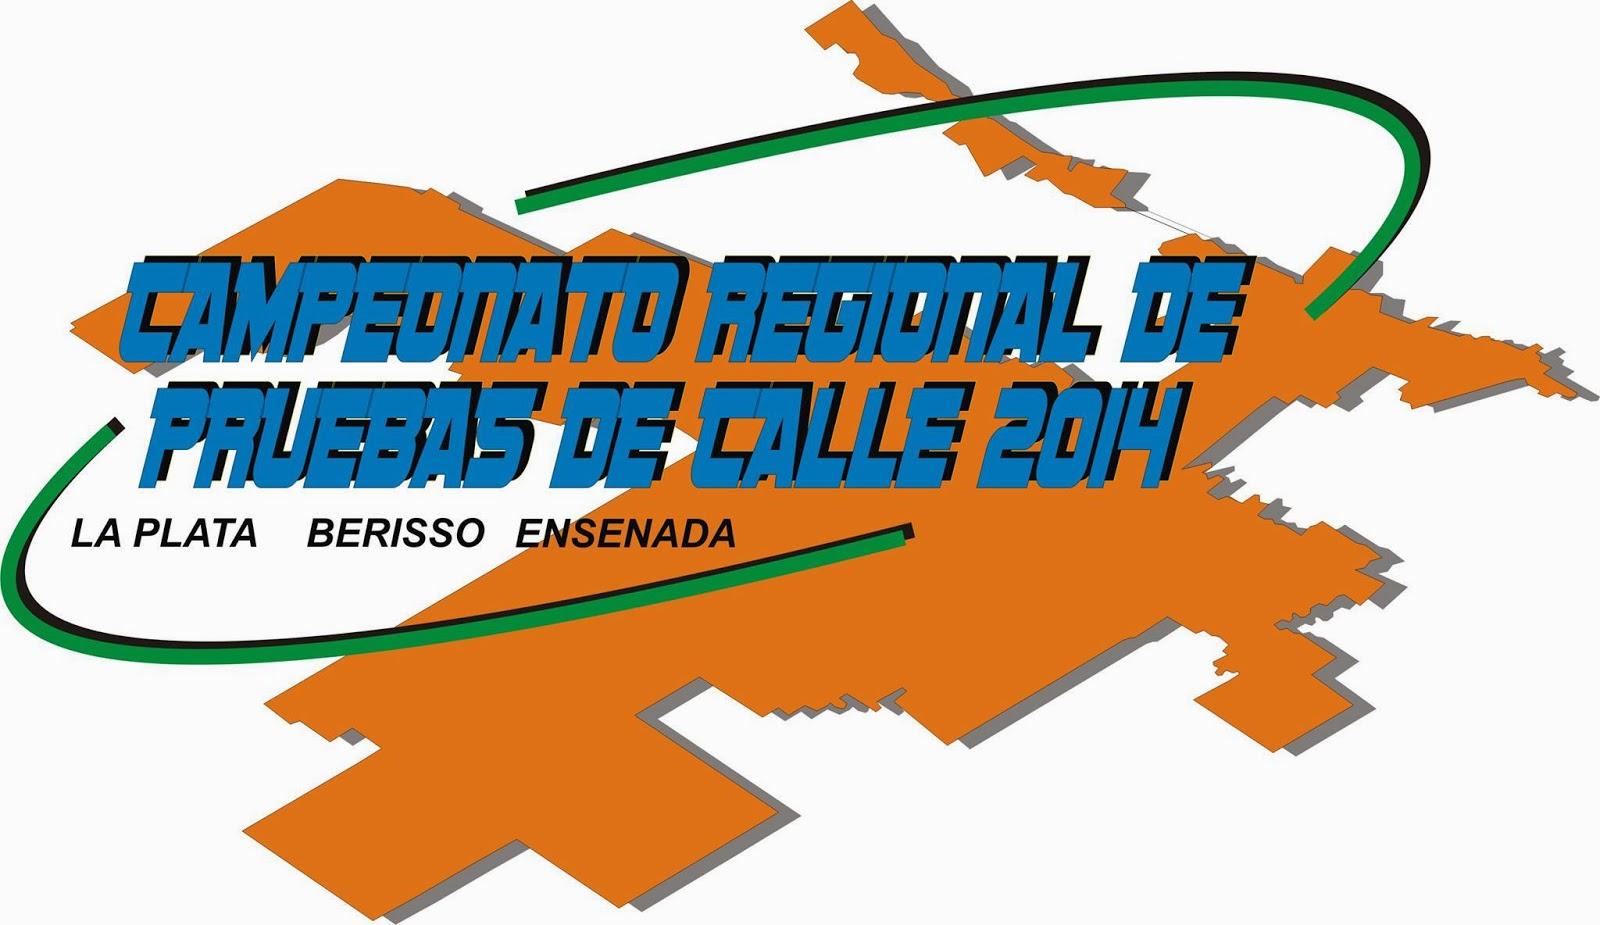 https://www.facebook.com/pages/Campeonato-Regional-de-Pruebas-de-Calle/237119863142151